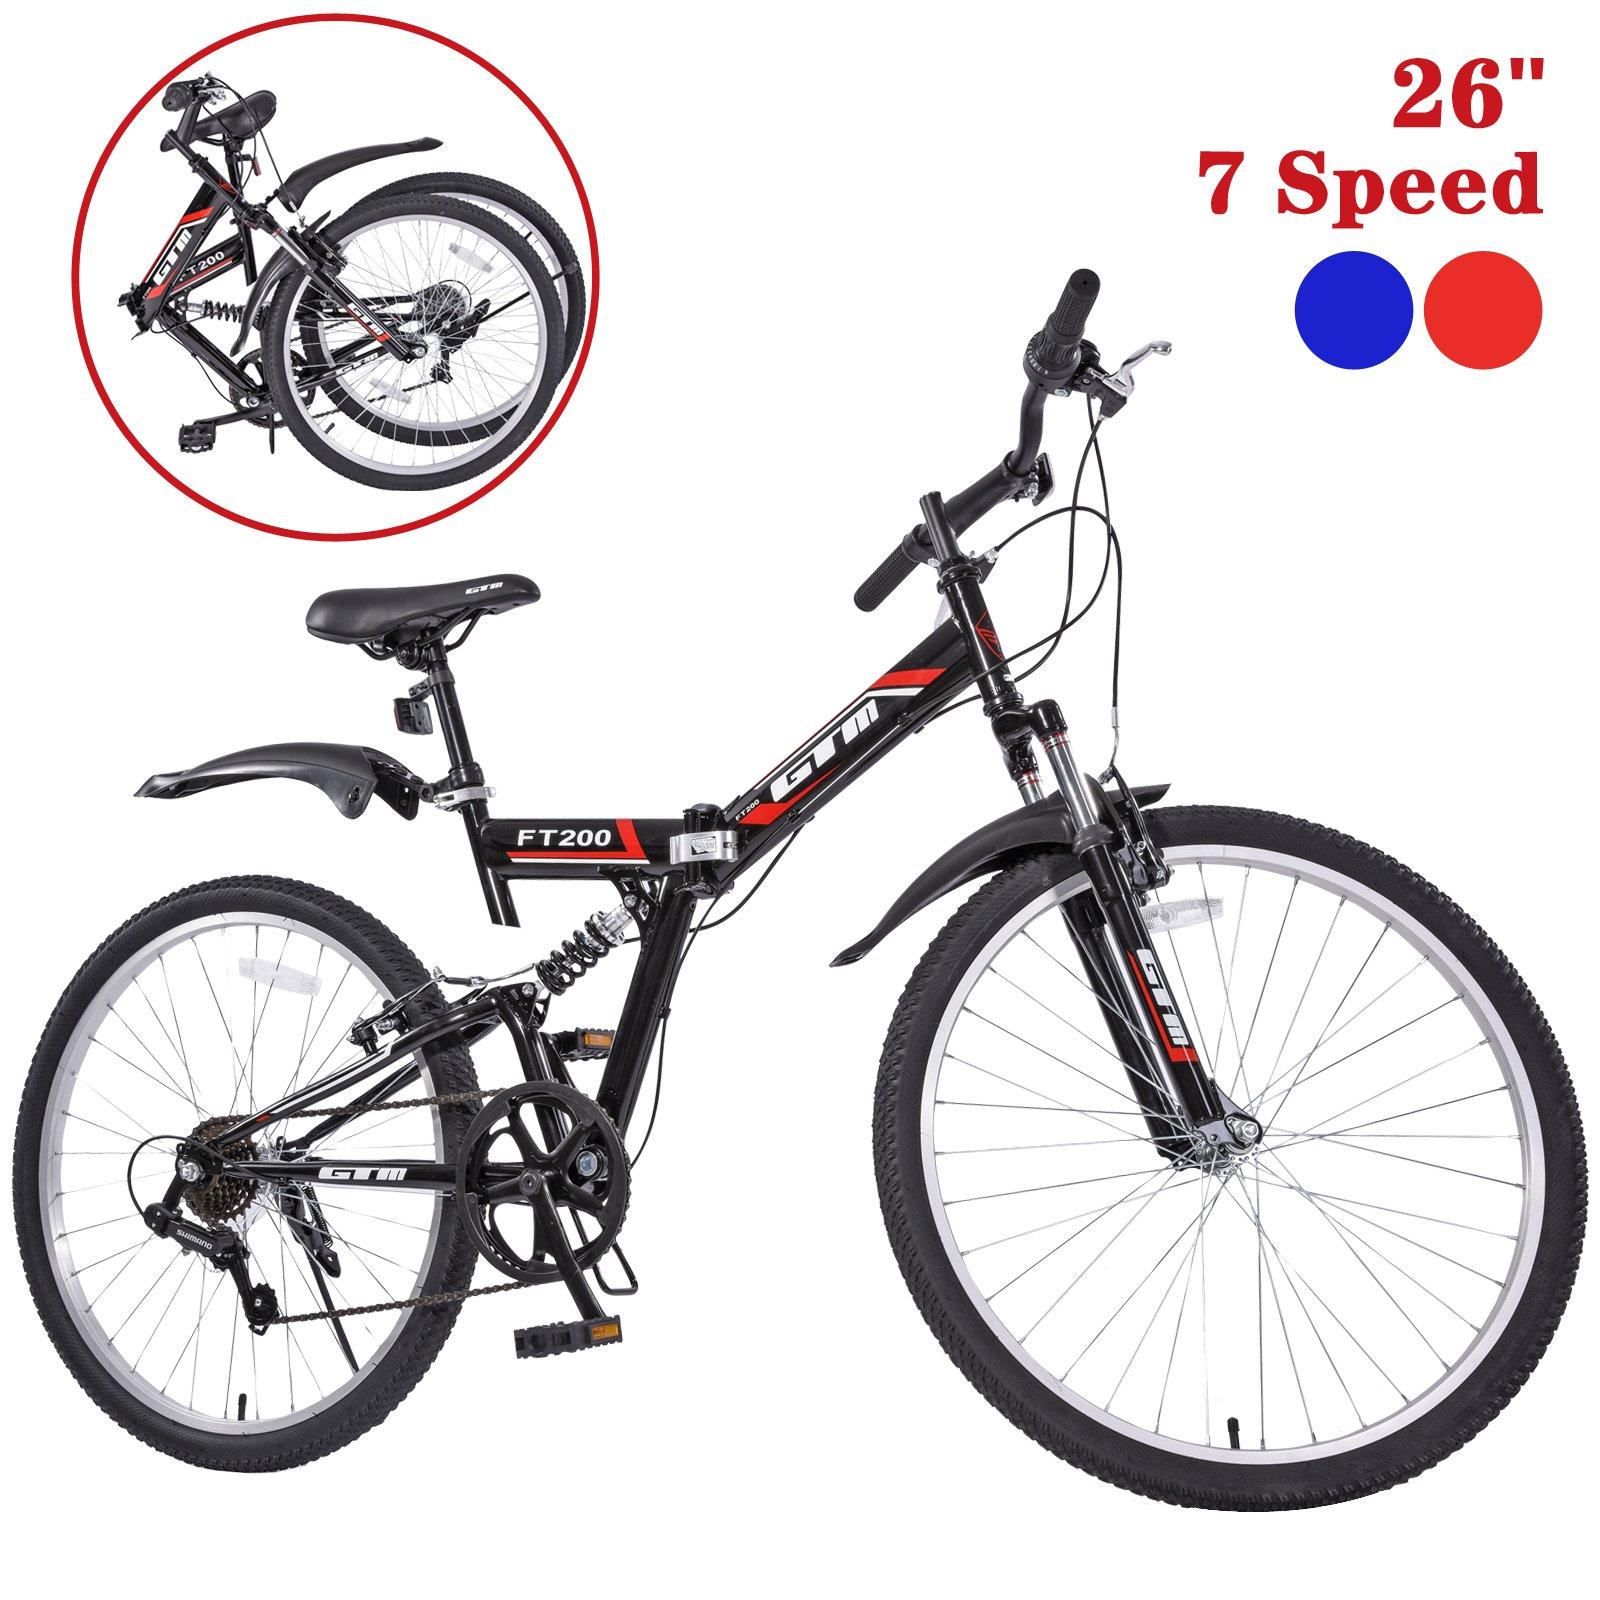 GTM 26'' 7 Speed Folding Mountain Bike Bicycle Shimano Hybrid Suspension MTB